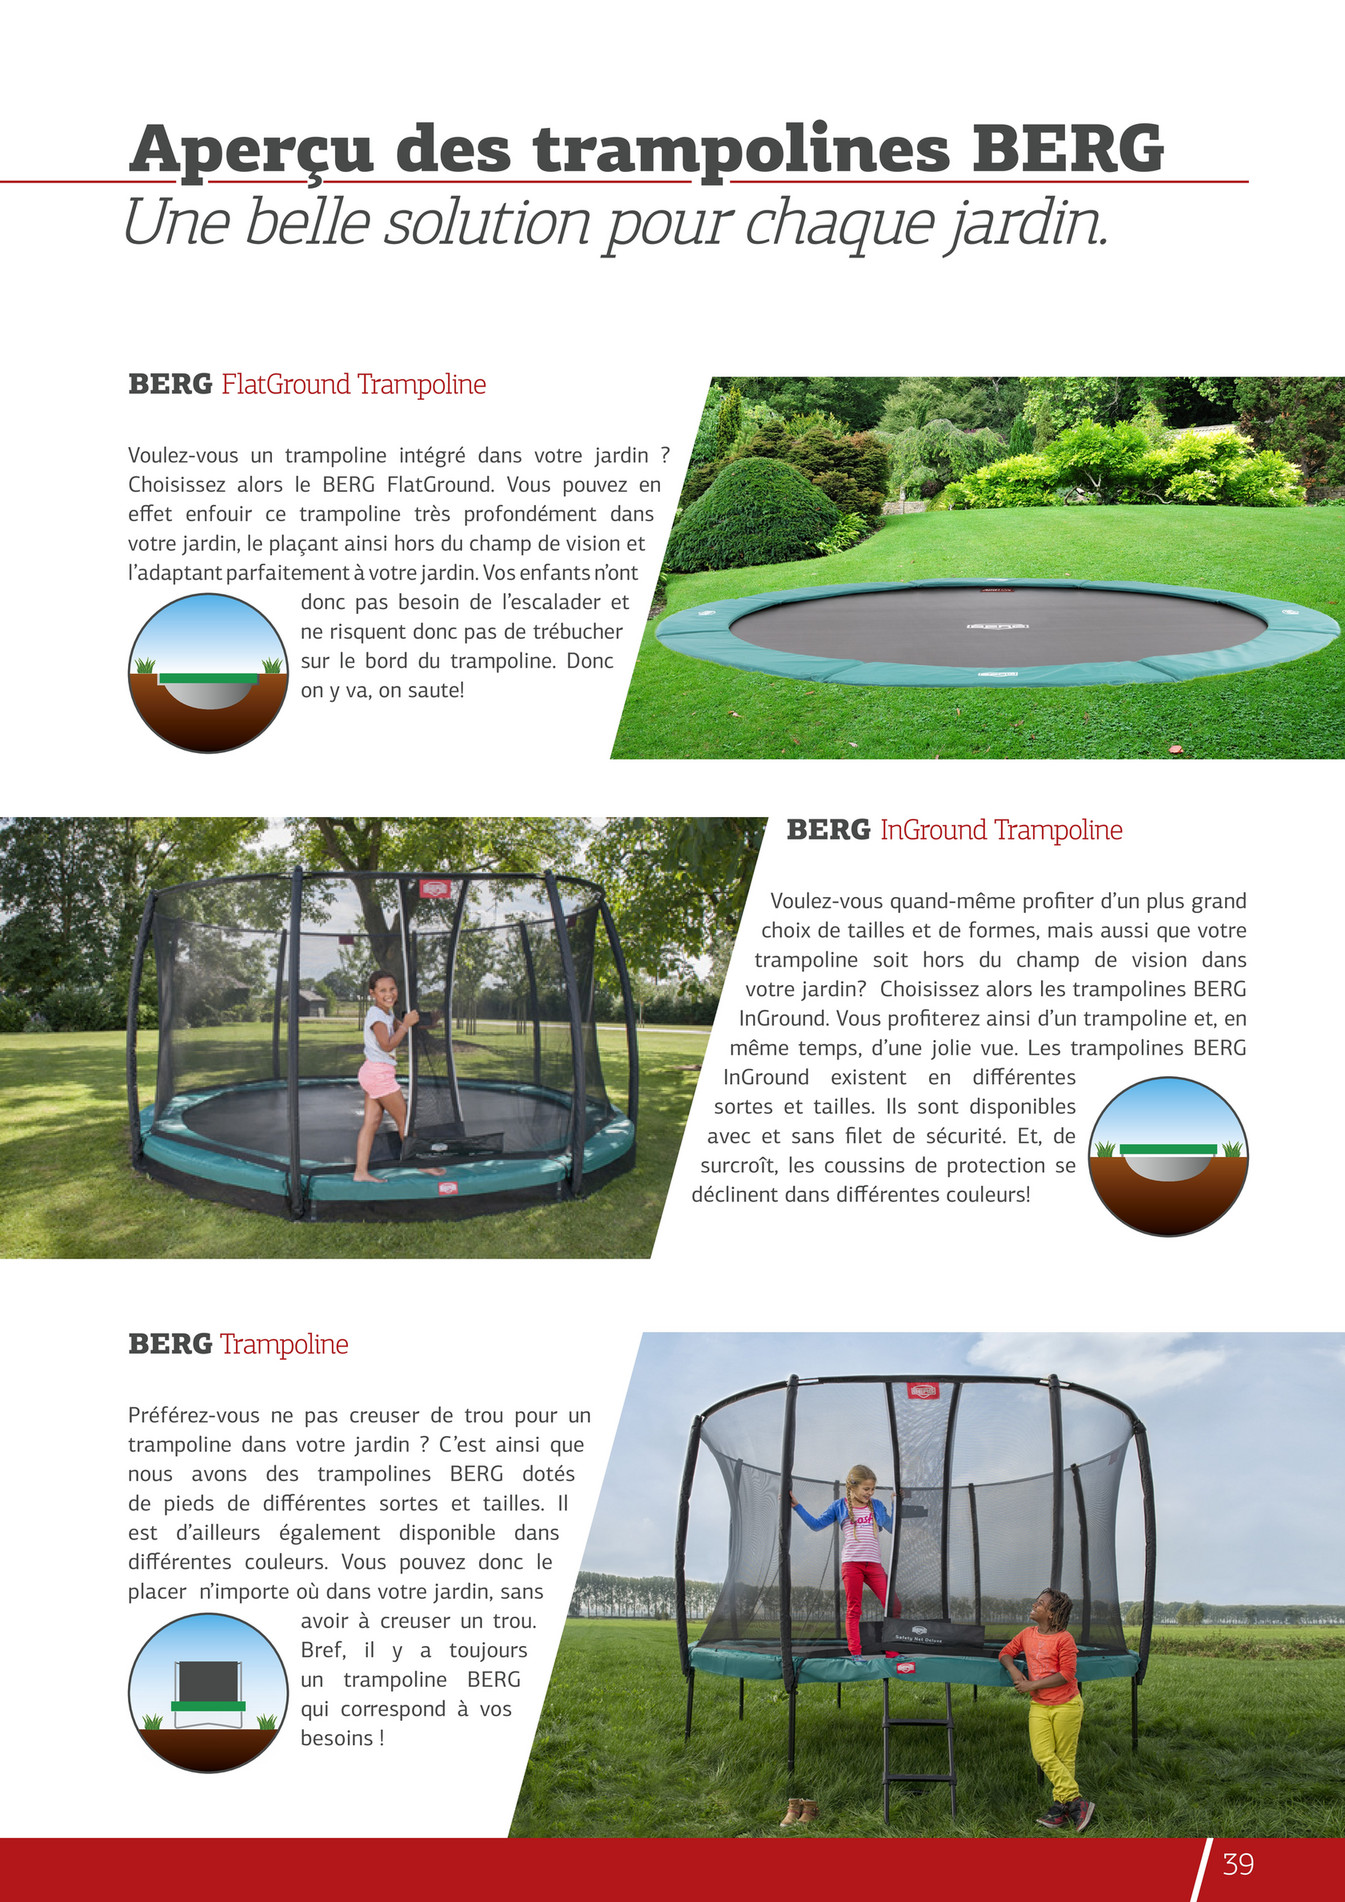 BERG FR 2017 Productbrochure FR Page 38 39